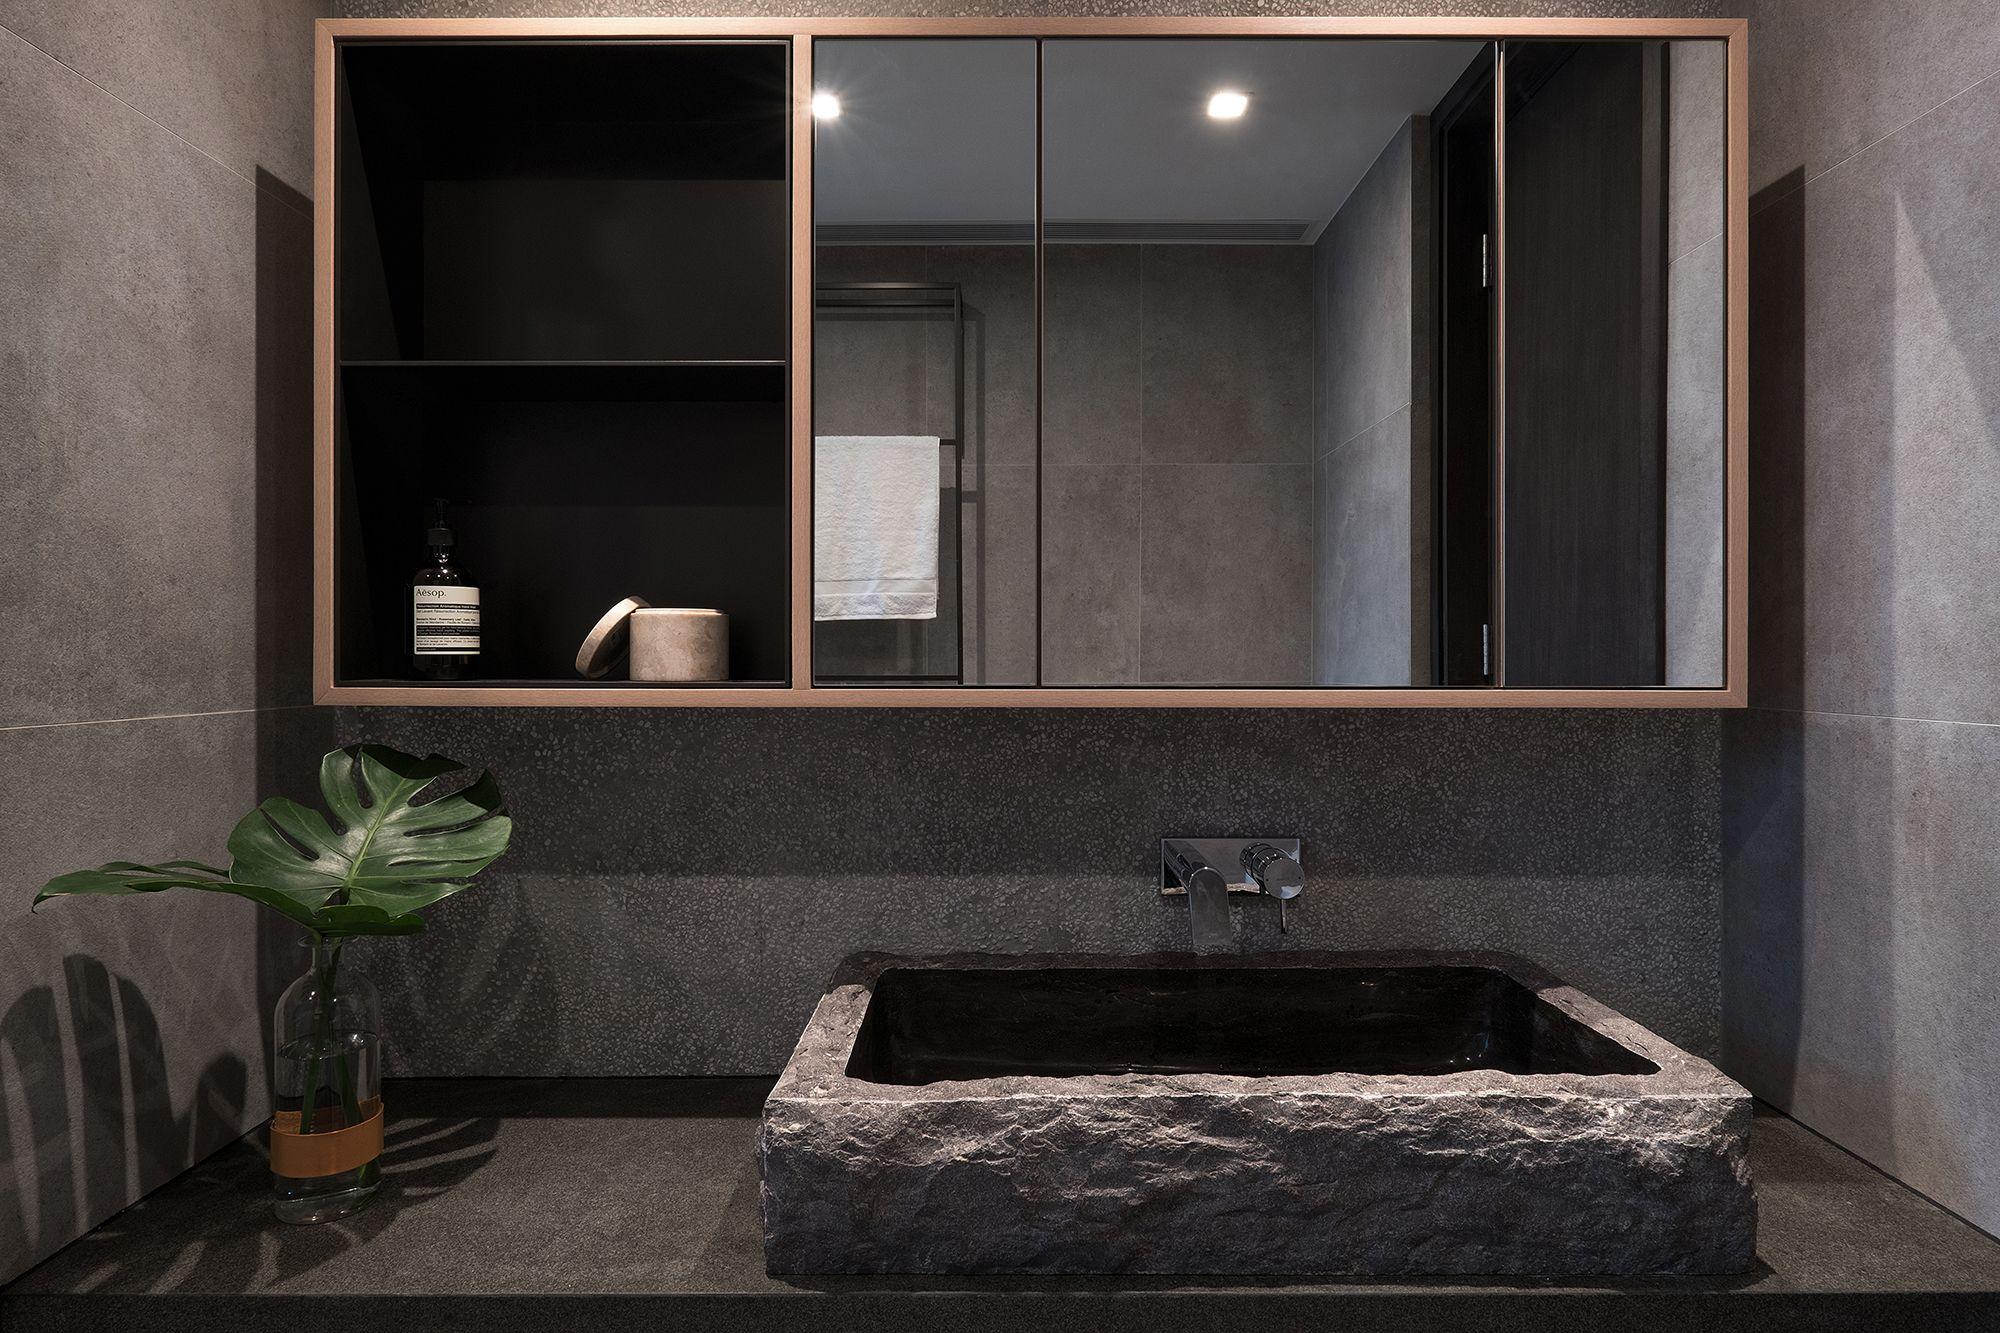 pavilion   otherwhere studio 山外工作室   Bathroom, Condo ...